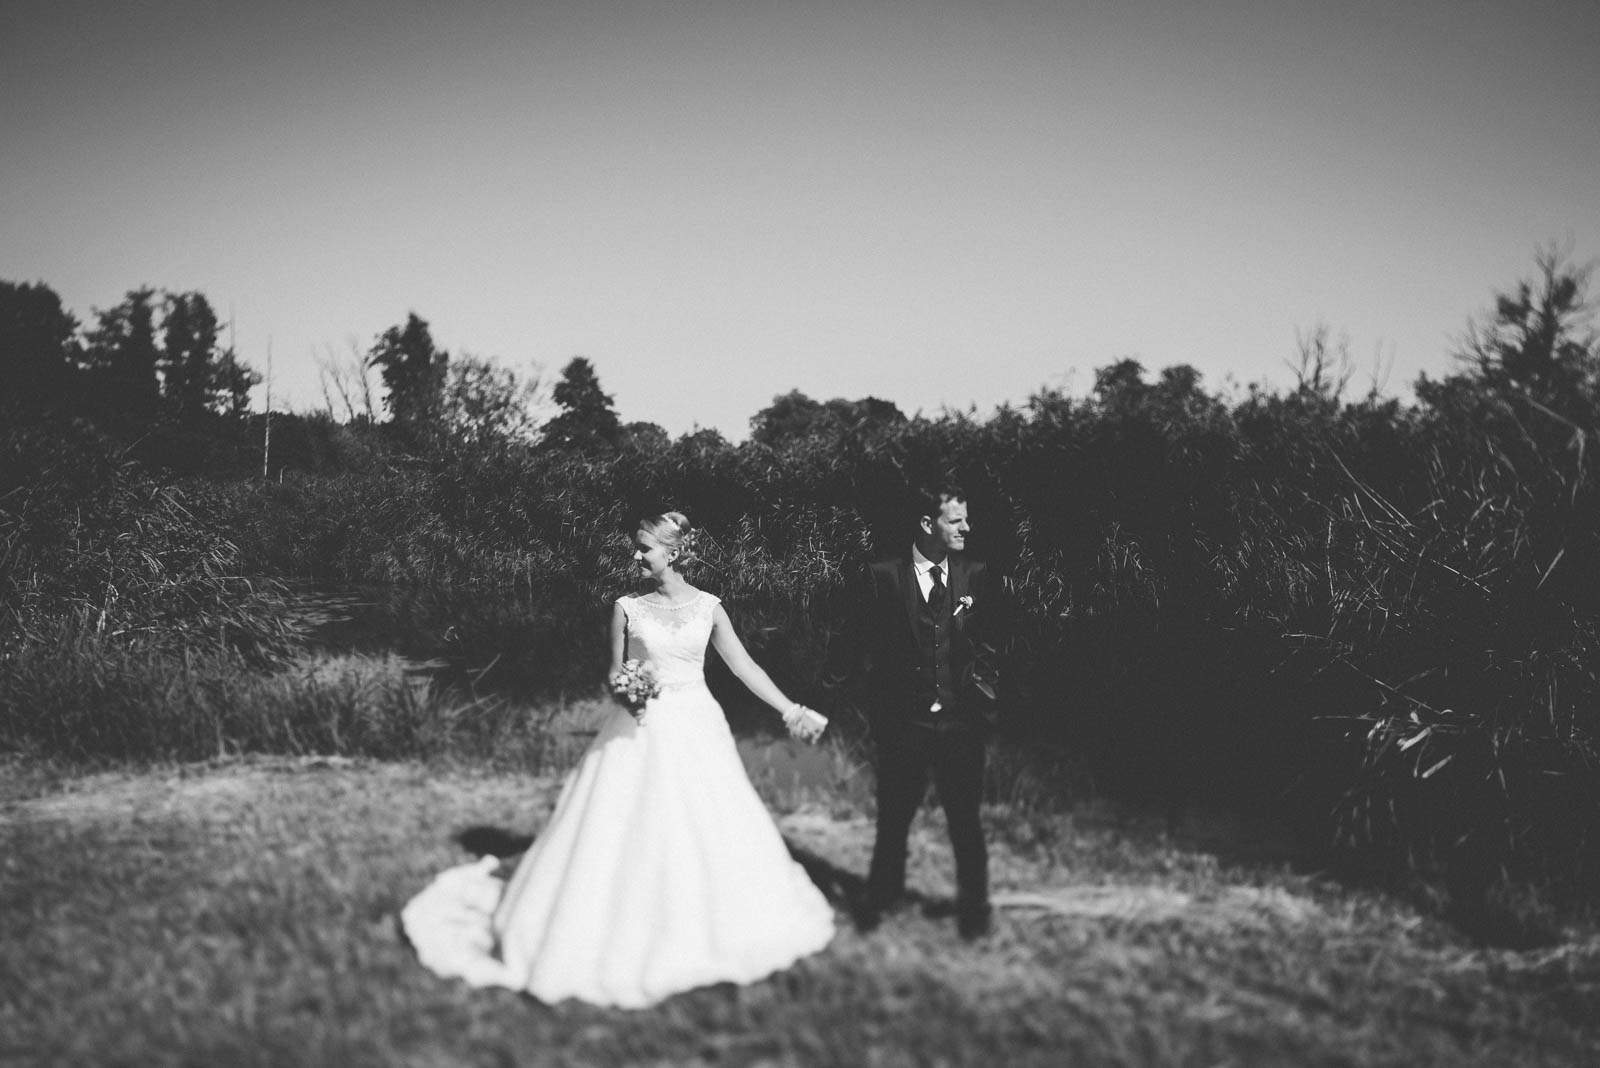 Wedding_Photography_072a